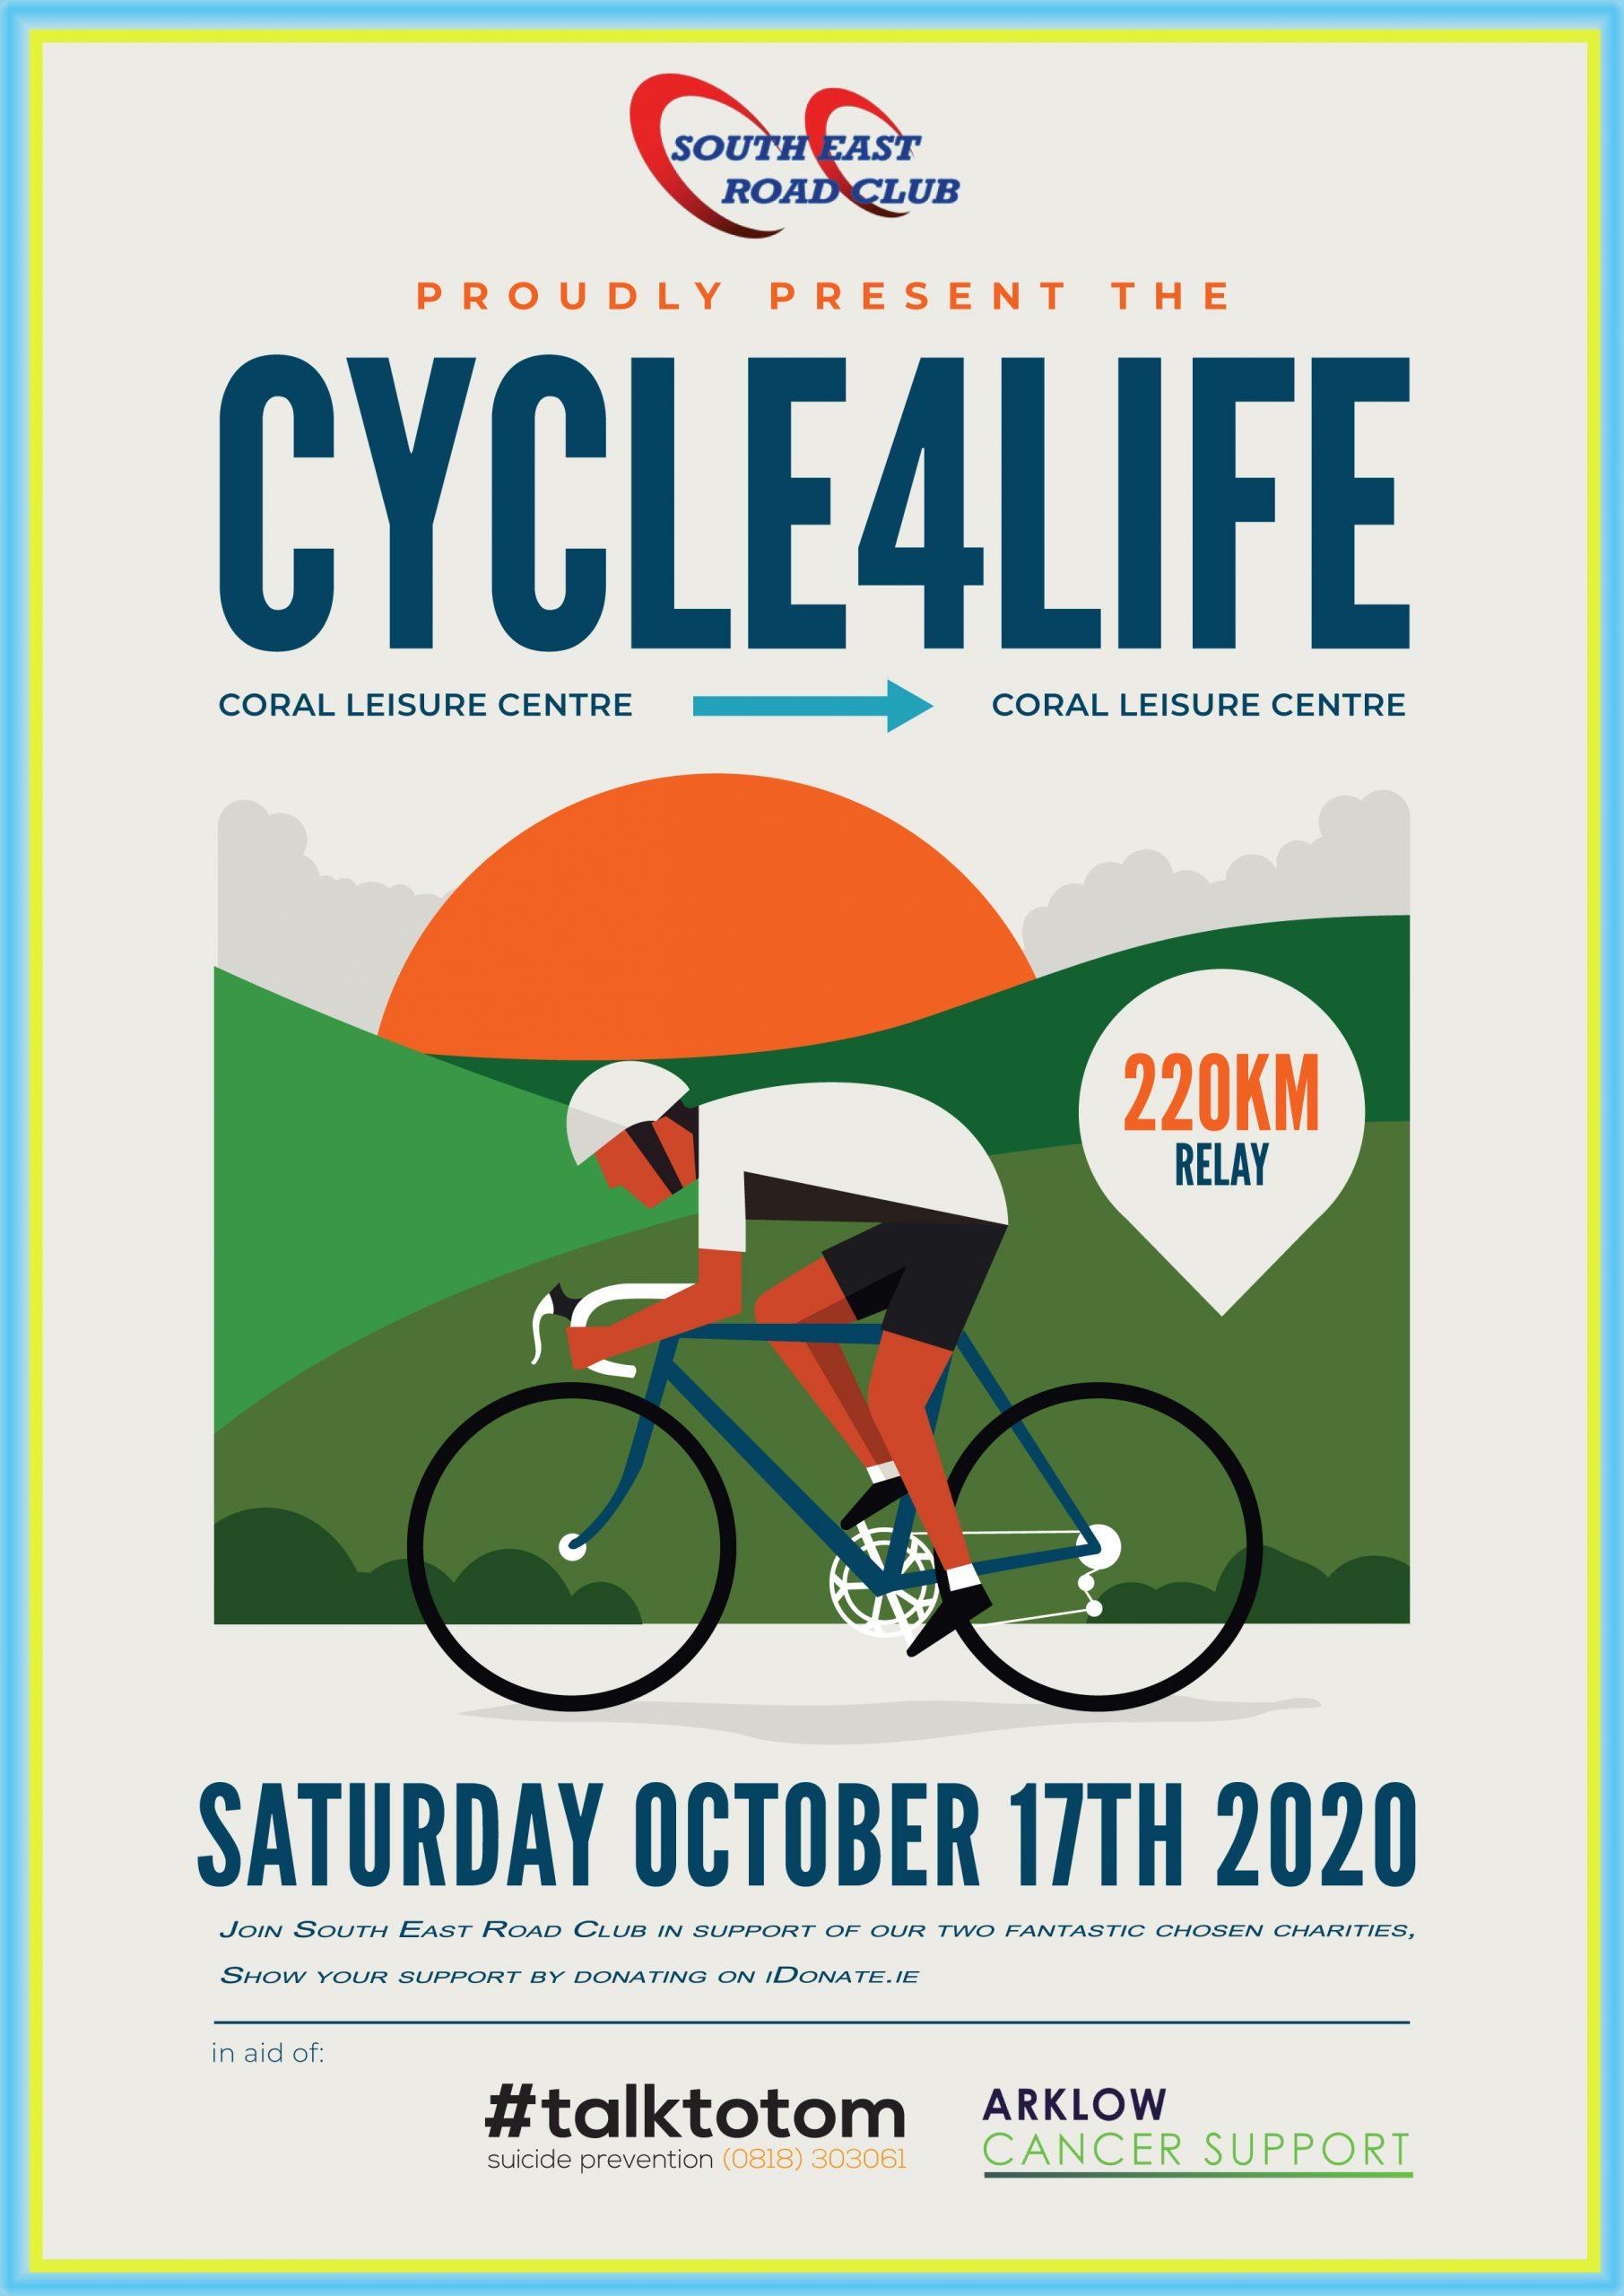 SERC Charity Cycle